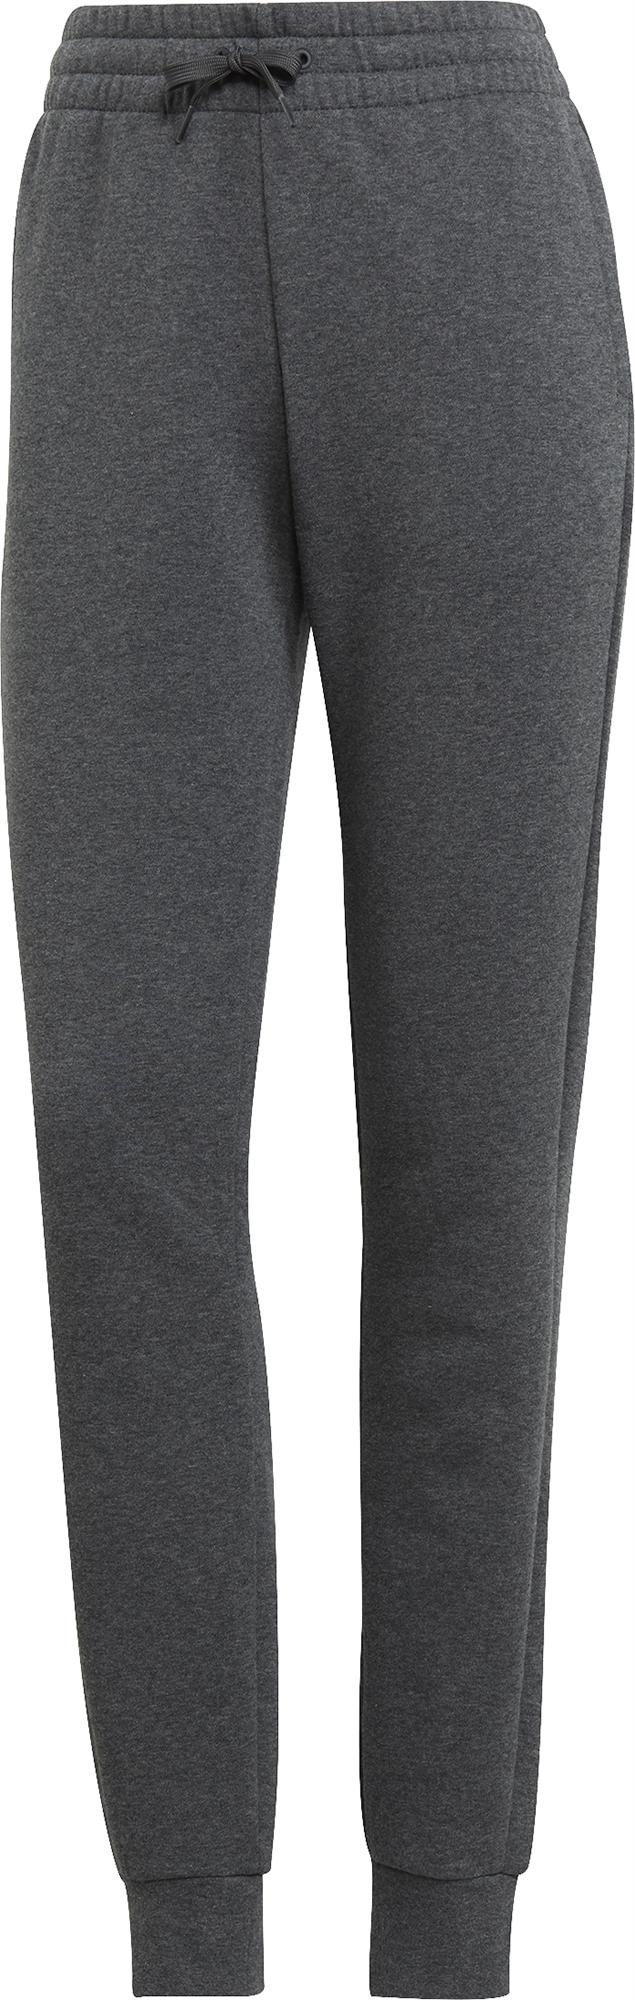 Adidas Брюки женские Essentials Linear, размер 54-56